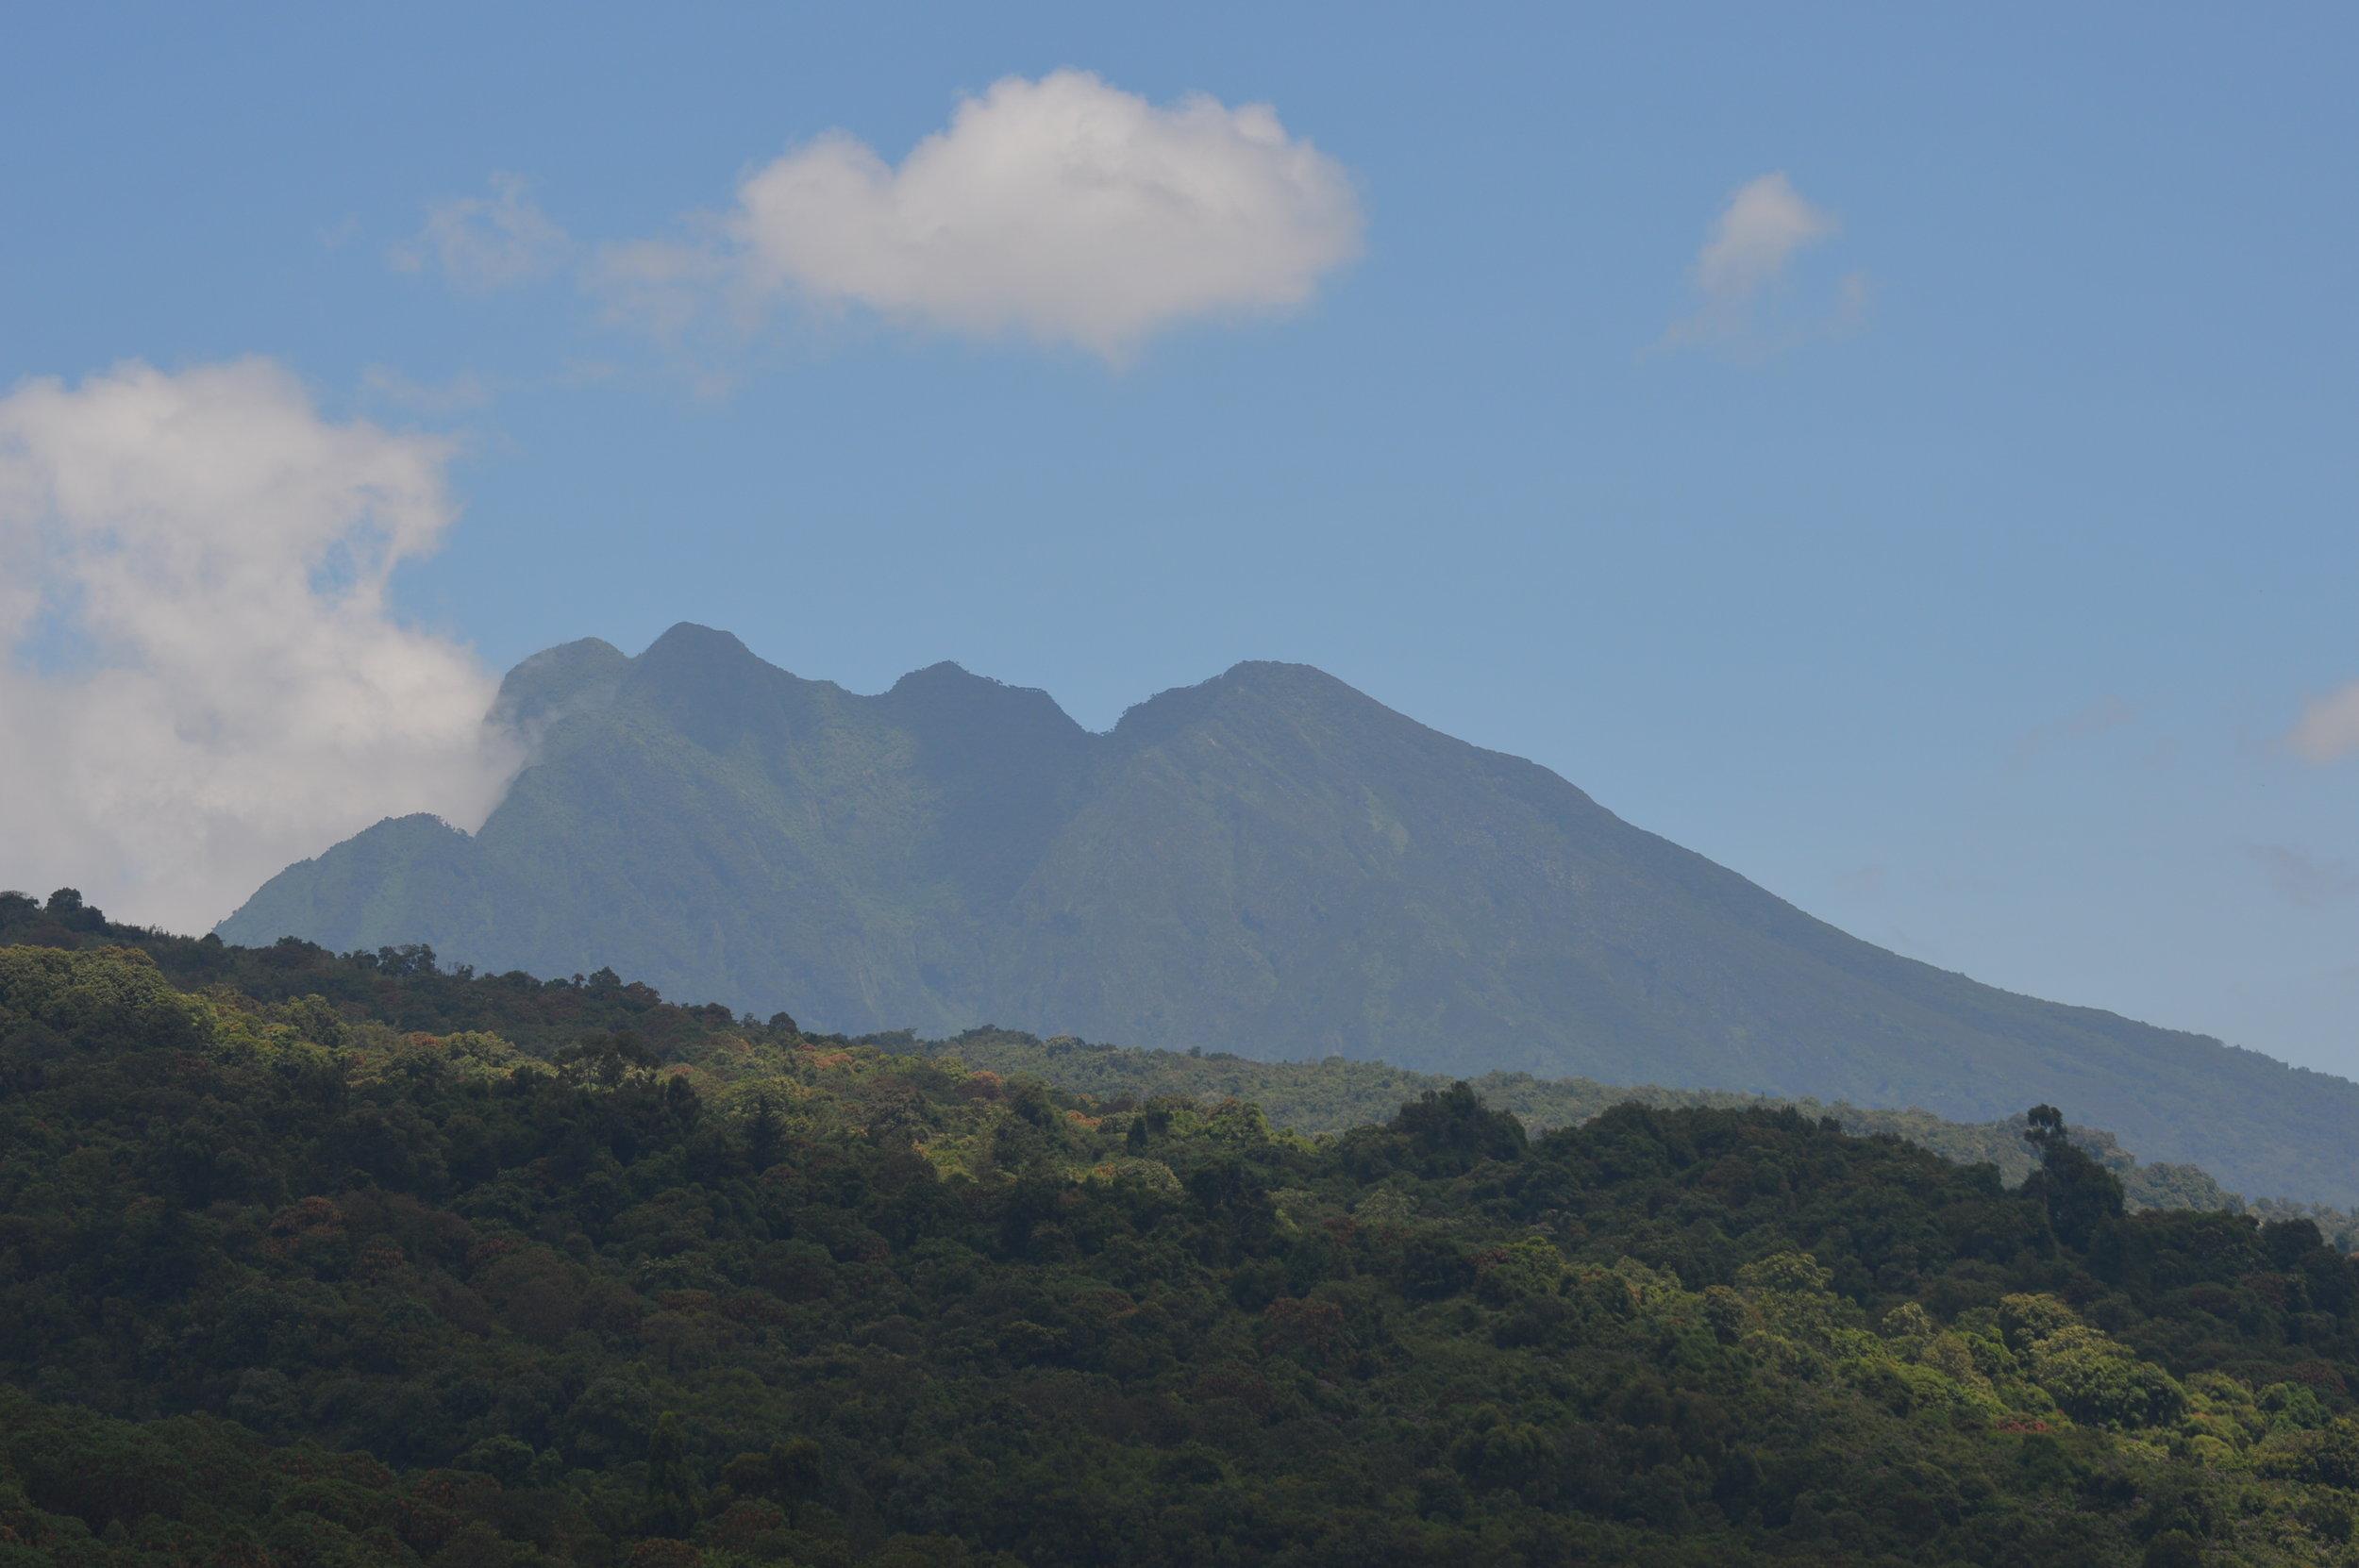 Mgahinga gorilla national park in Uganda part of the virunga massif with sabinyo volcaic peaks in far display